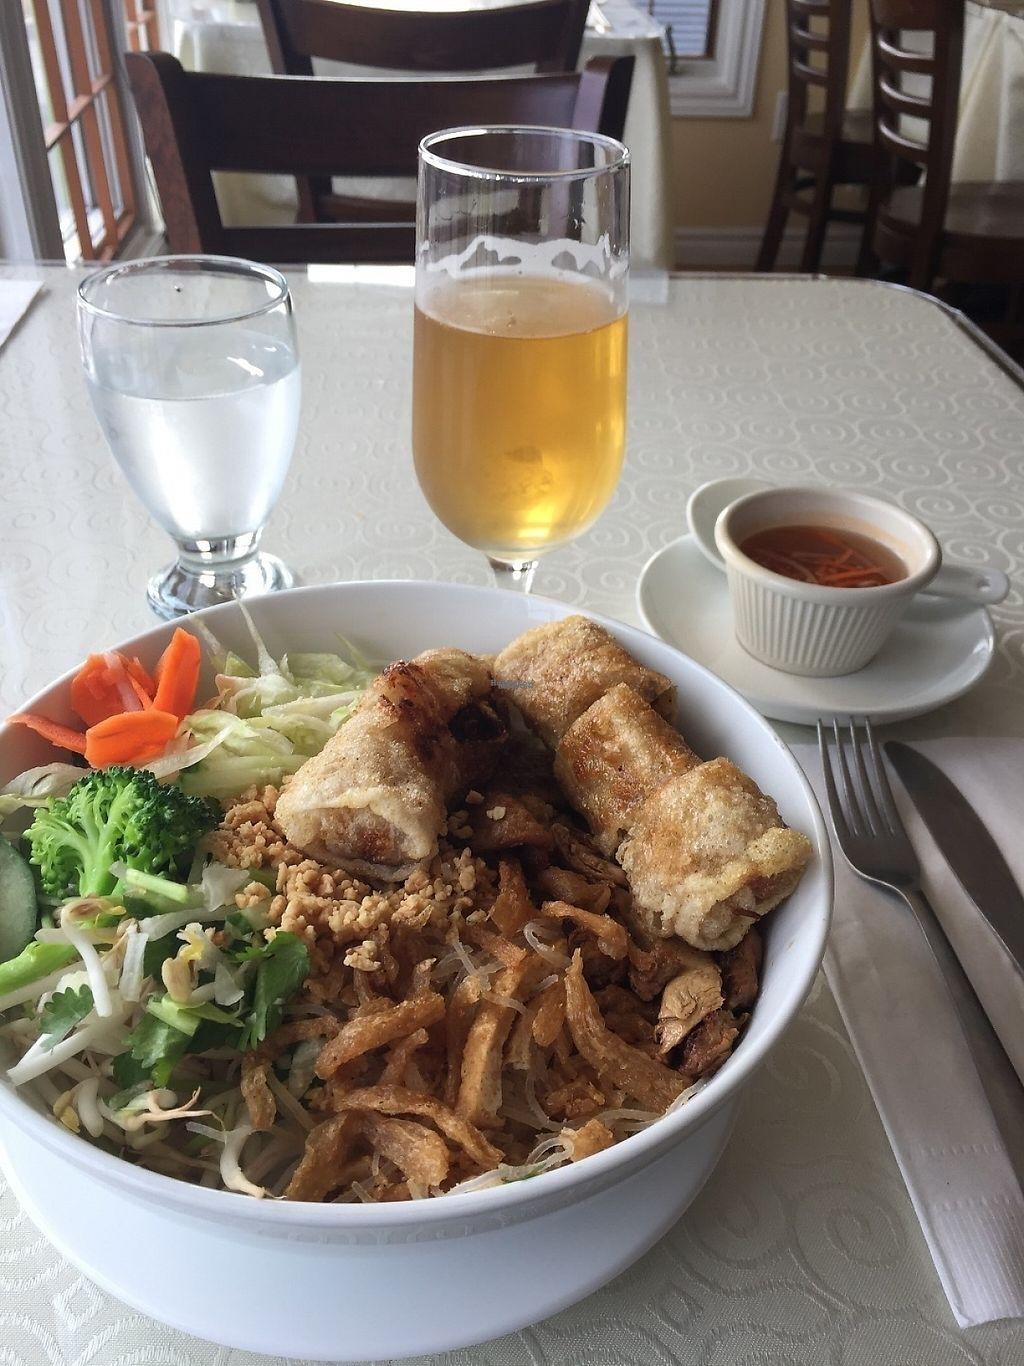 "Photo of Veggie Vietnam Restaurant  by <a href=""/members/profile/maximumca"">maximumca</a> <br/>Combo #3 <br/> April 11, 2017  - <a href='/contact/abuse/image/73824/247082'>Report</a>"